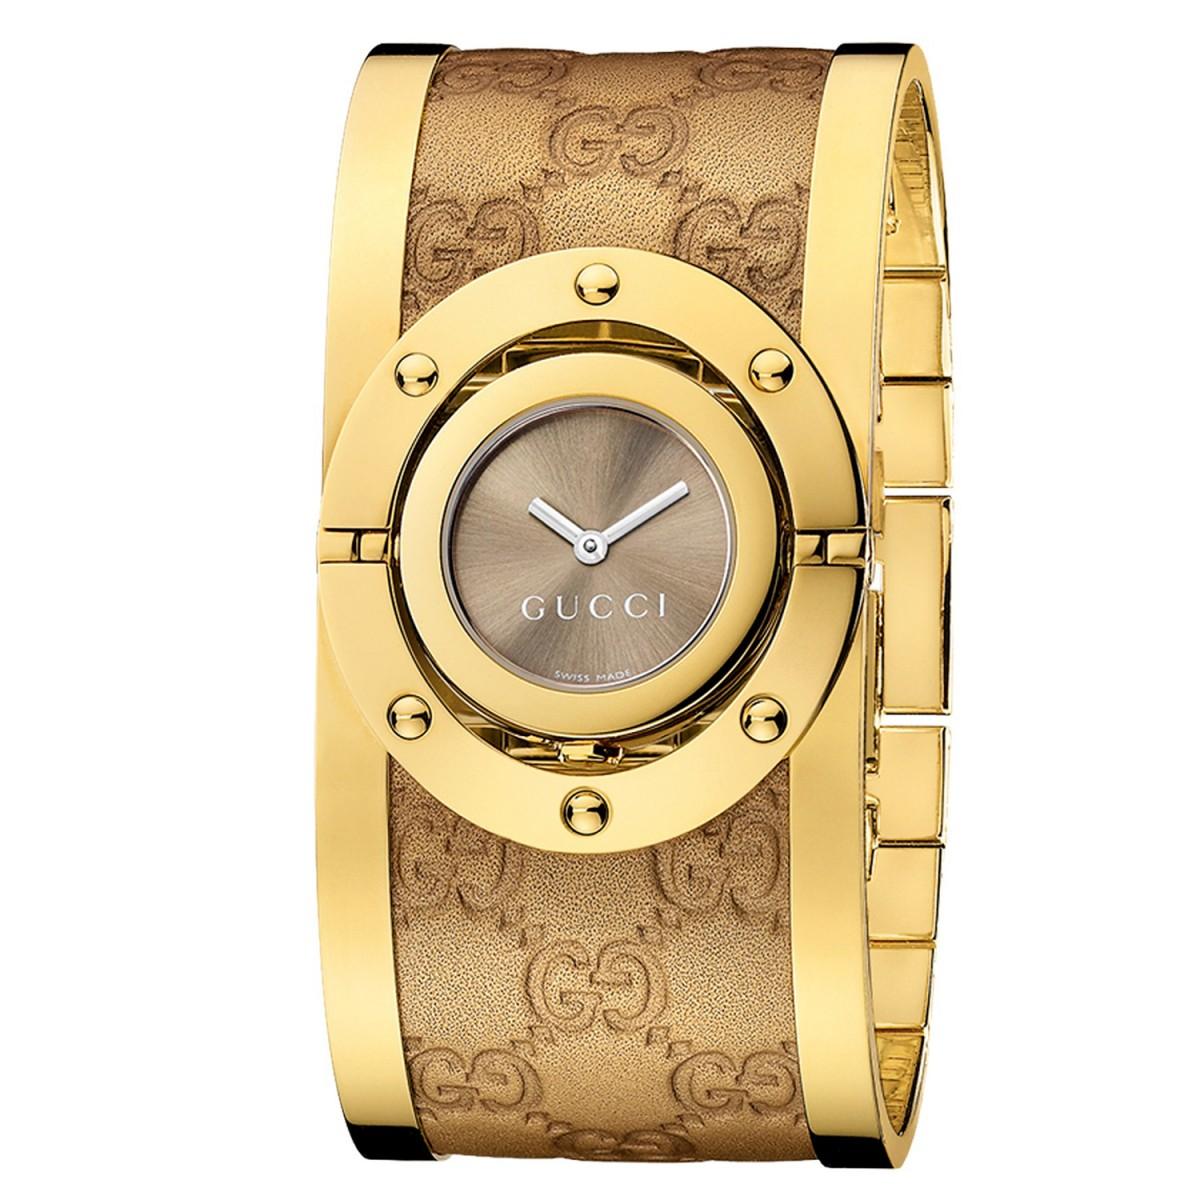 0b53aa2571d Compre Relógio Gucci Twirl em 10X